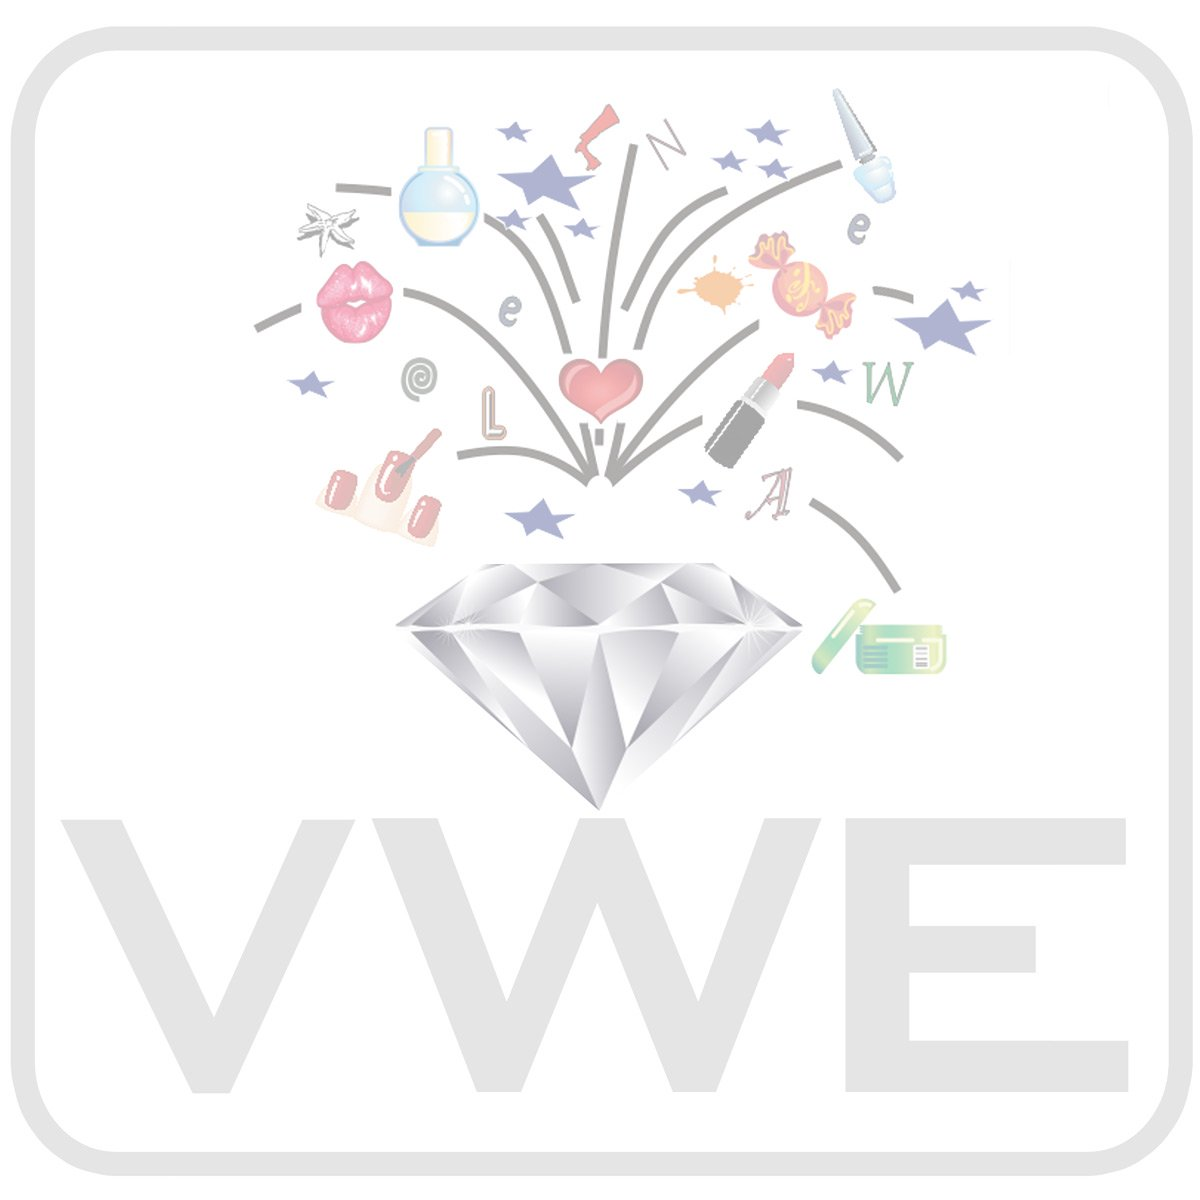 UV Gel Flux Diamond Touch Colour Pop Art - 5ml  [1 / 12]